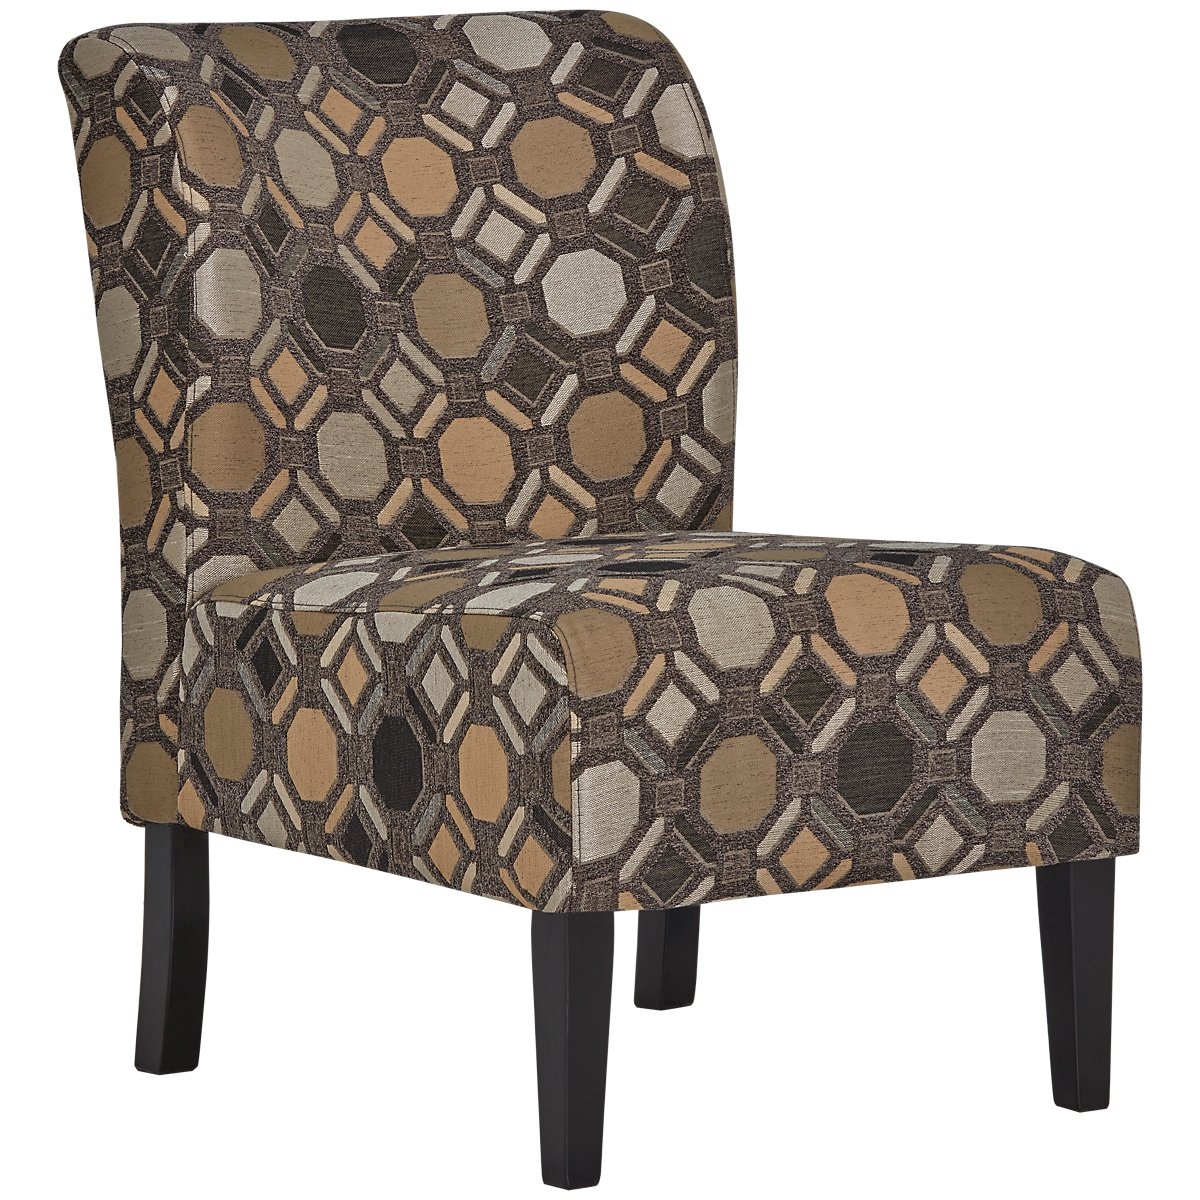 City Furniture: Laryn Multicolored Microfiber Accent Chair